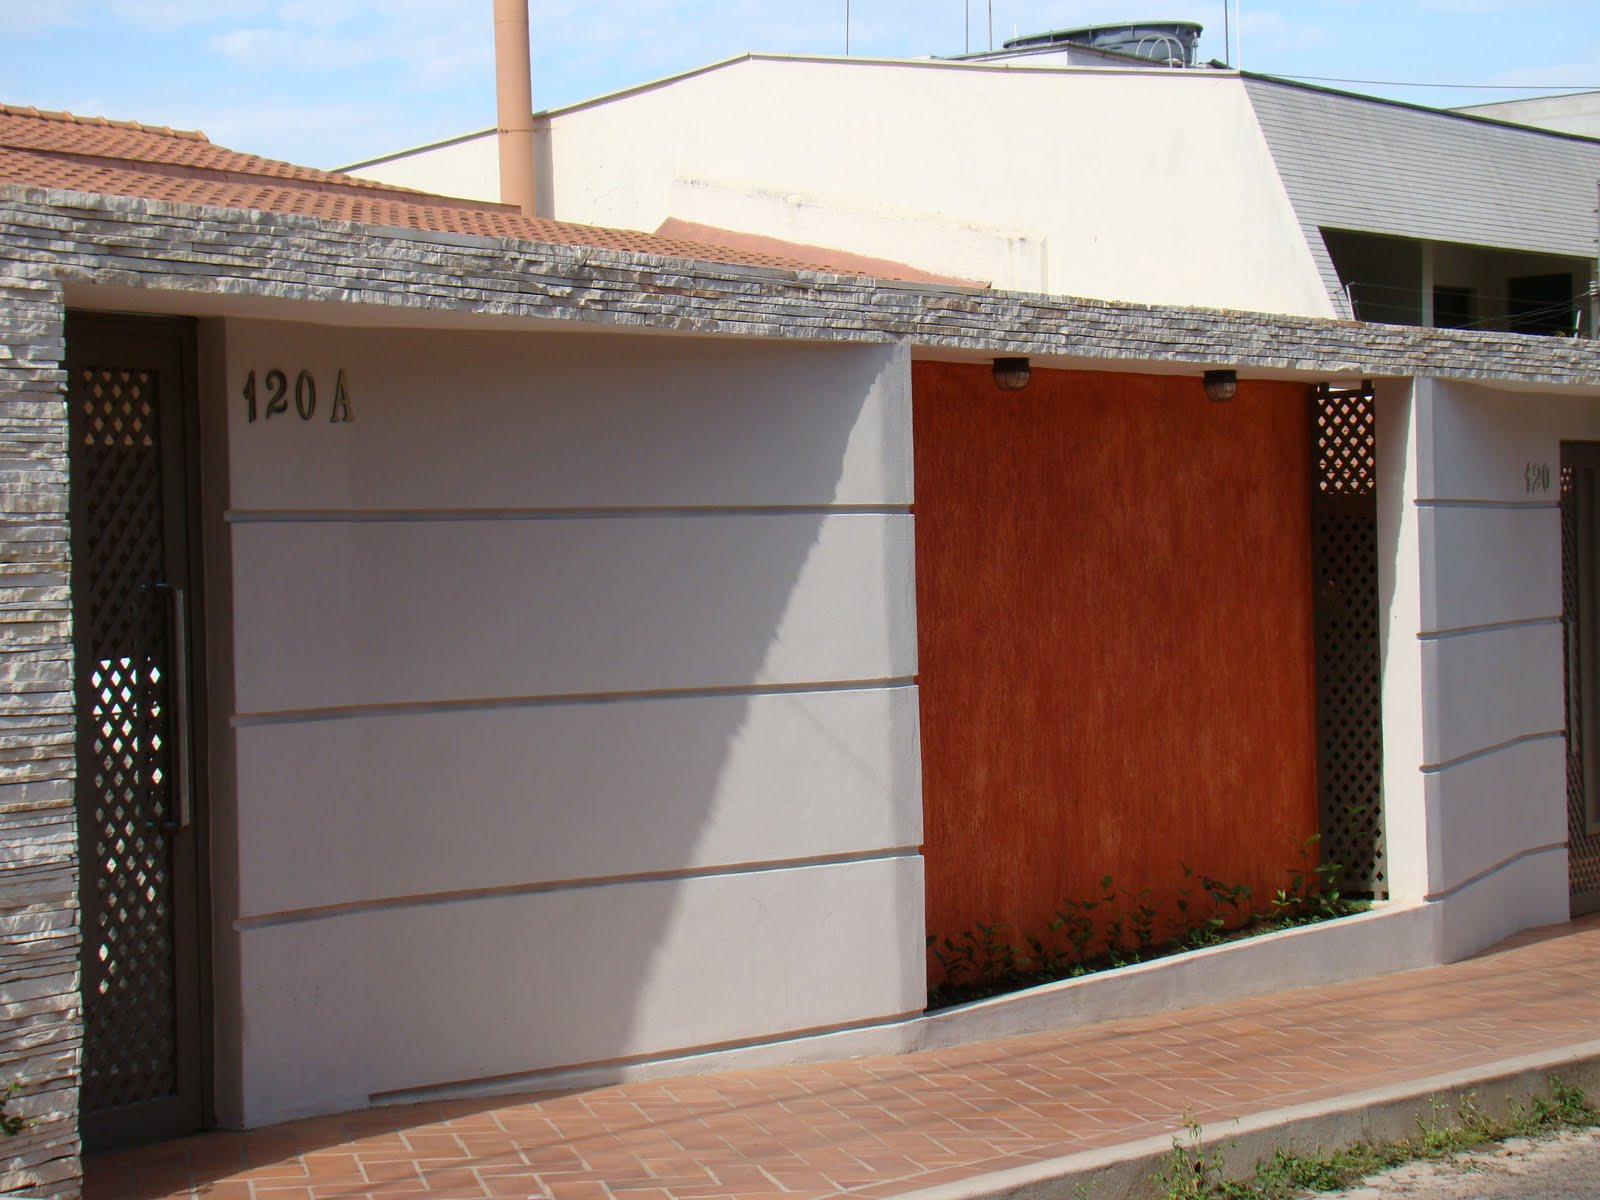 Fachadas de muros residenciais – Fotos e dicas